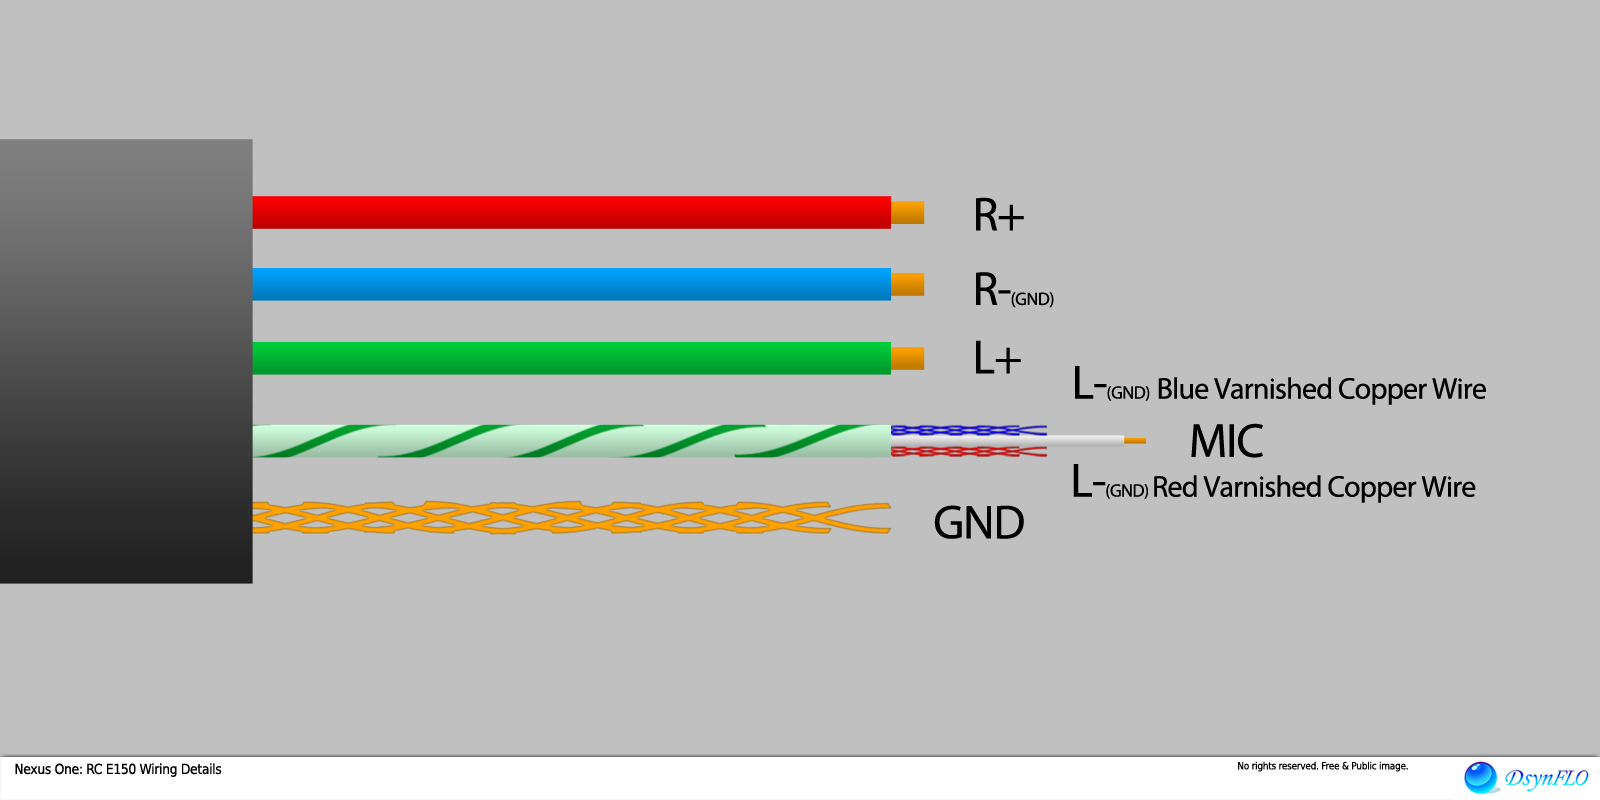 phone headset wiring  diagram yy 9590  wiring furthermore rca plug wiring diagram as well as  furthermore rca plug wiring diagram